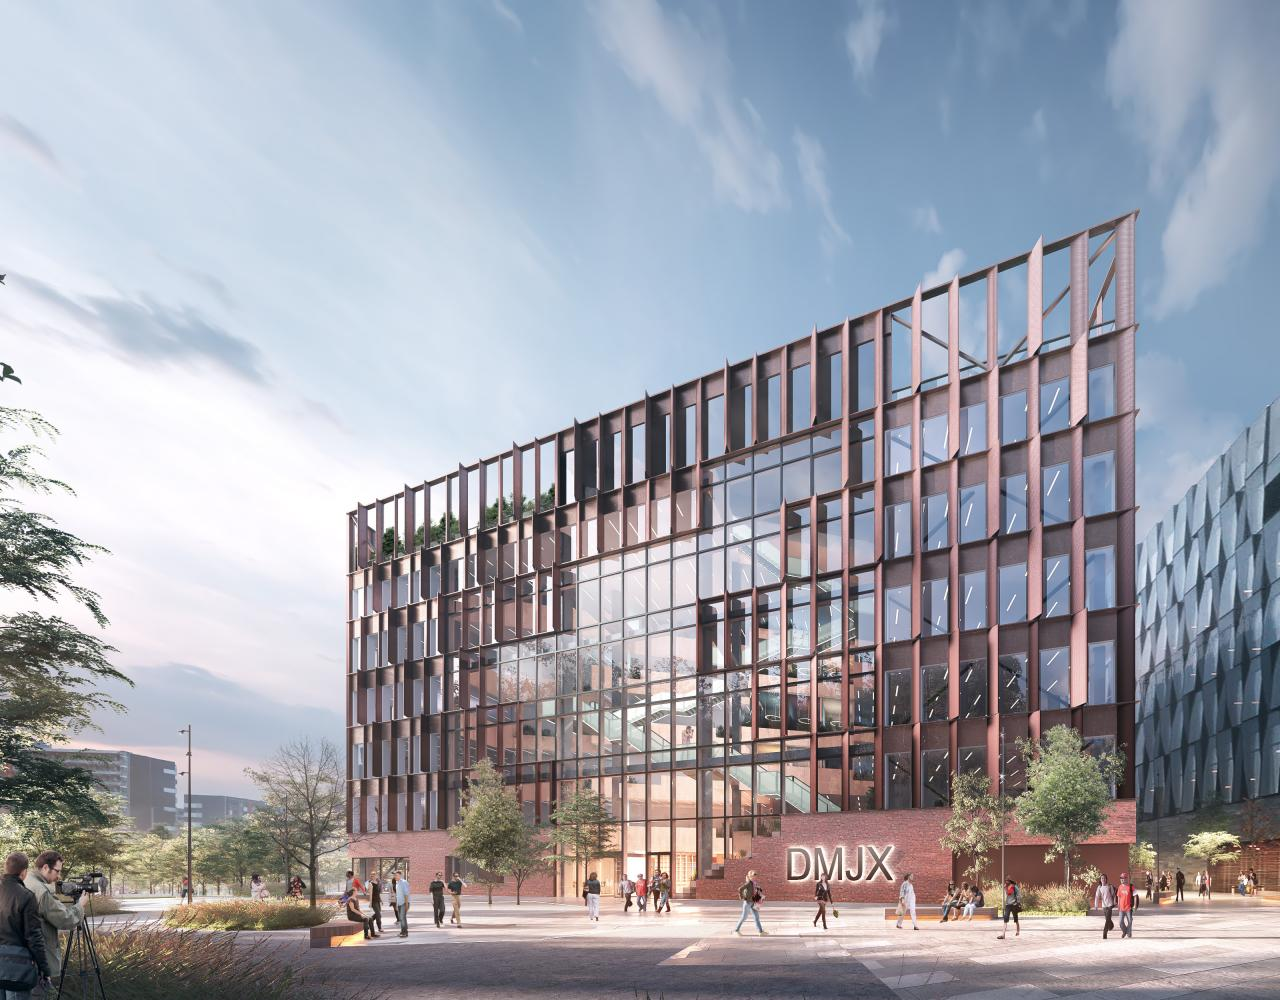 PLH Arkitekter, DMJX, Ørestad, journalisthøjskole